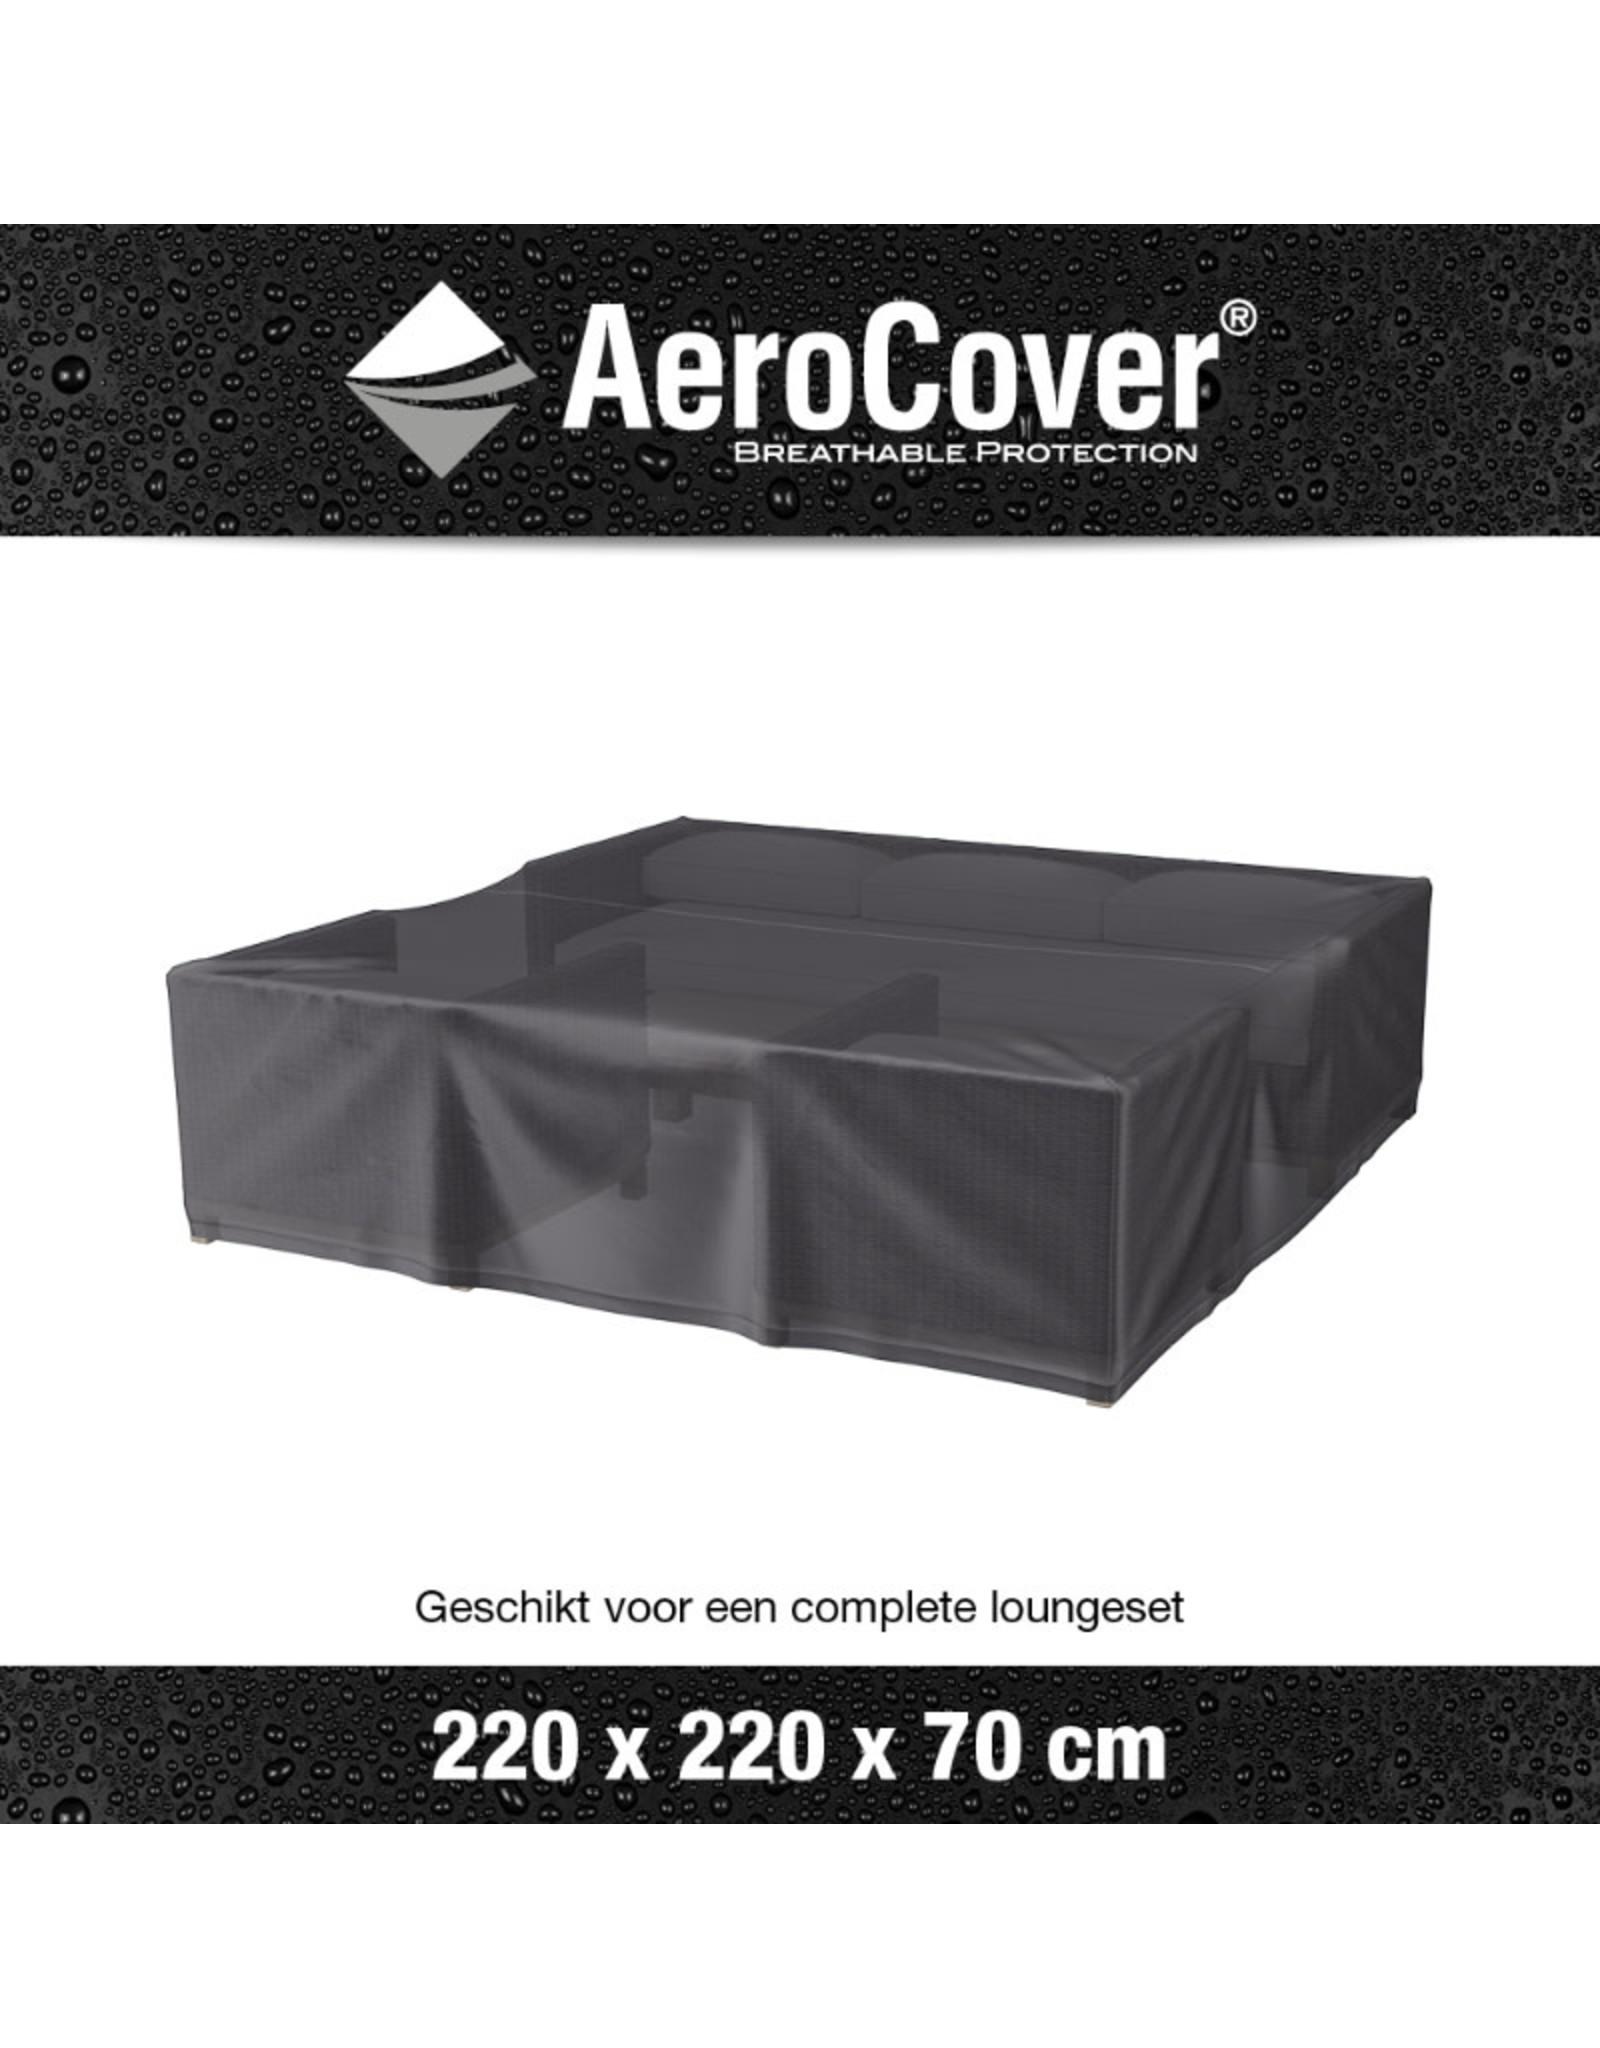 Aerocover AeroCover Loungesethoes 220x220xH70cm